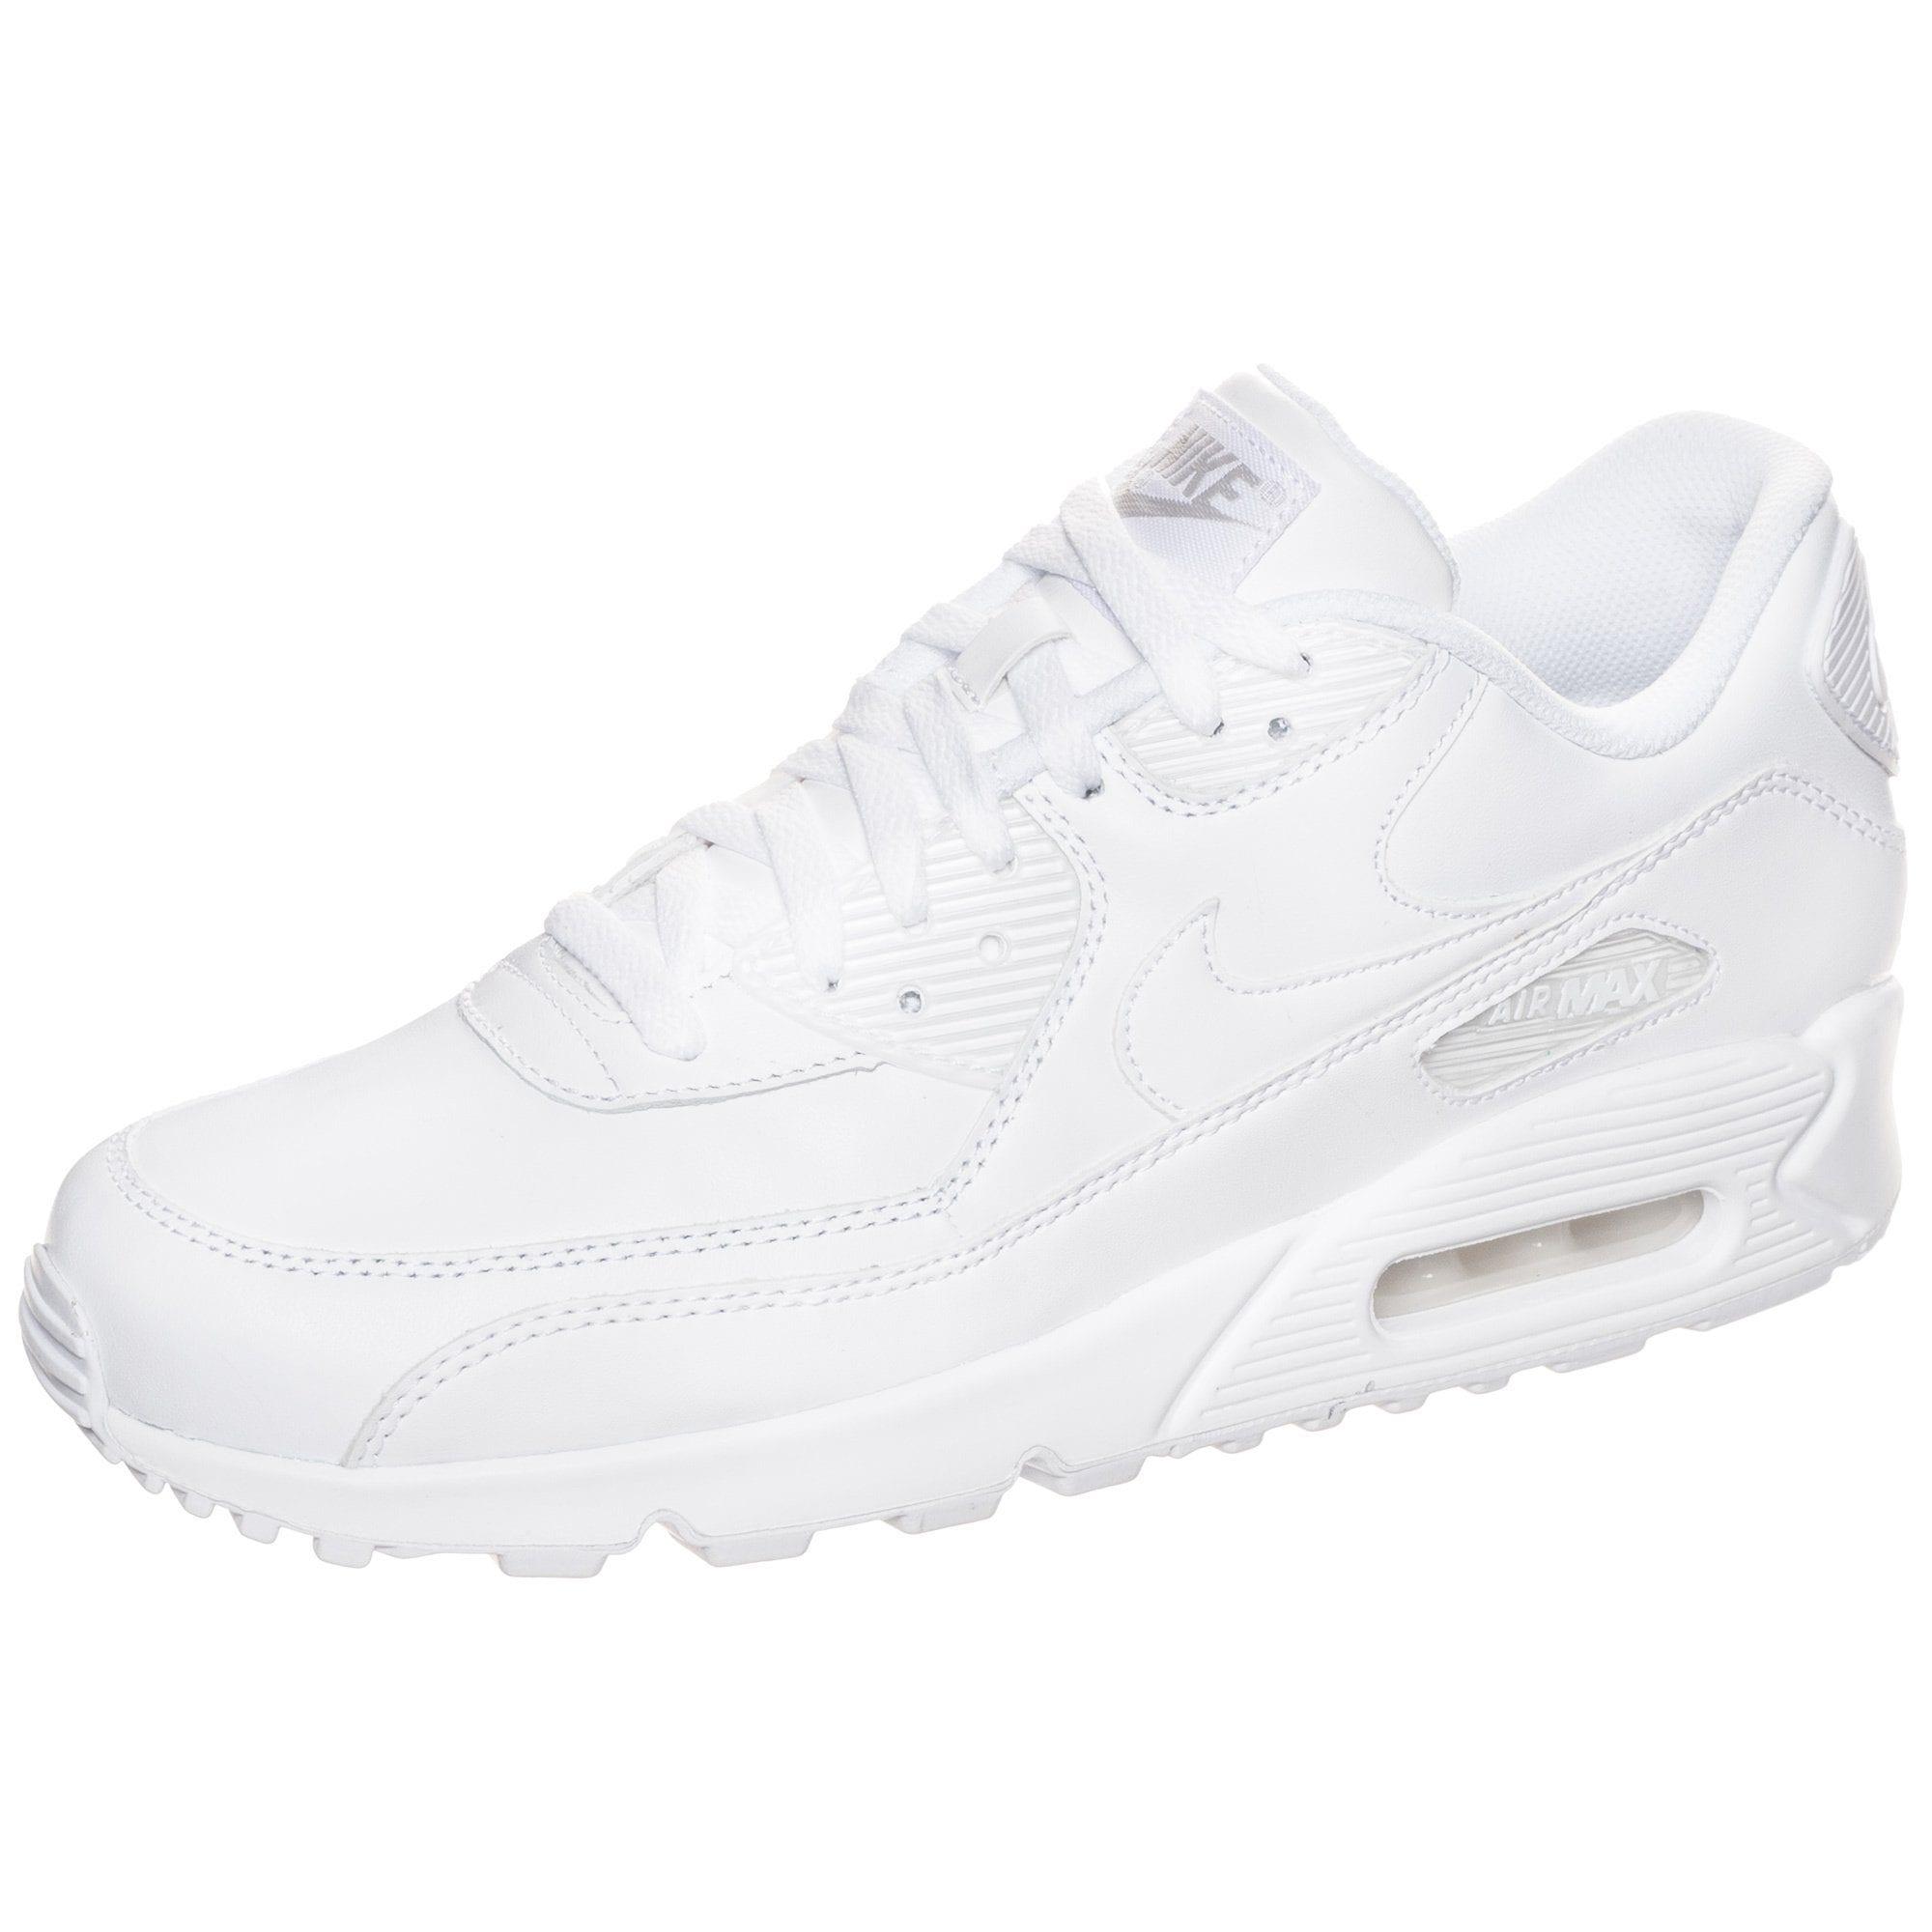 Nike Sportswear Sneaker Nike Air Max 90 Leder Sneaker Herren online bestellen   Gutes Preis-Leistungs-Verhältnis, es lohnt sich